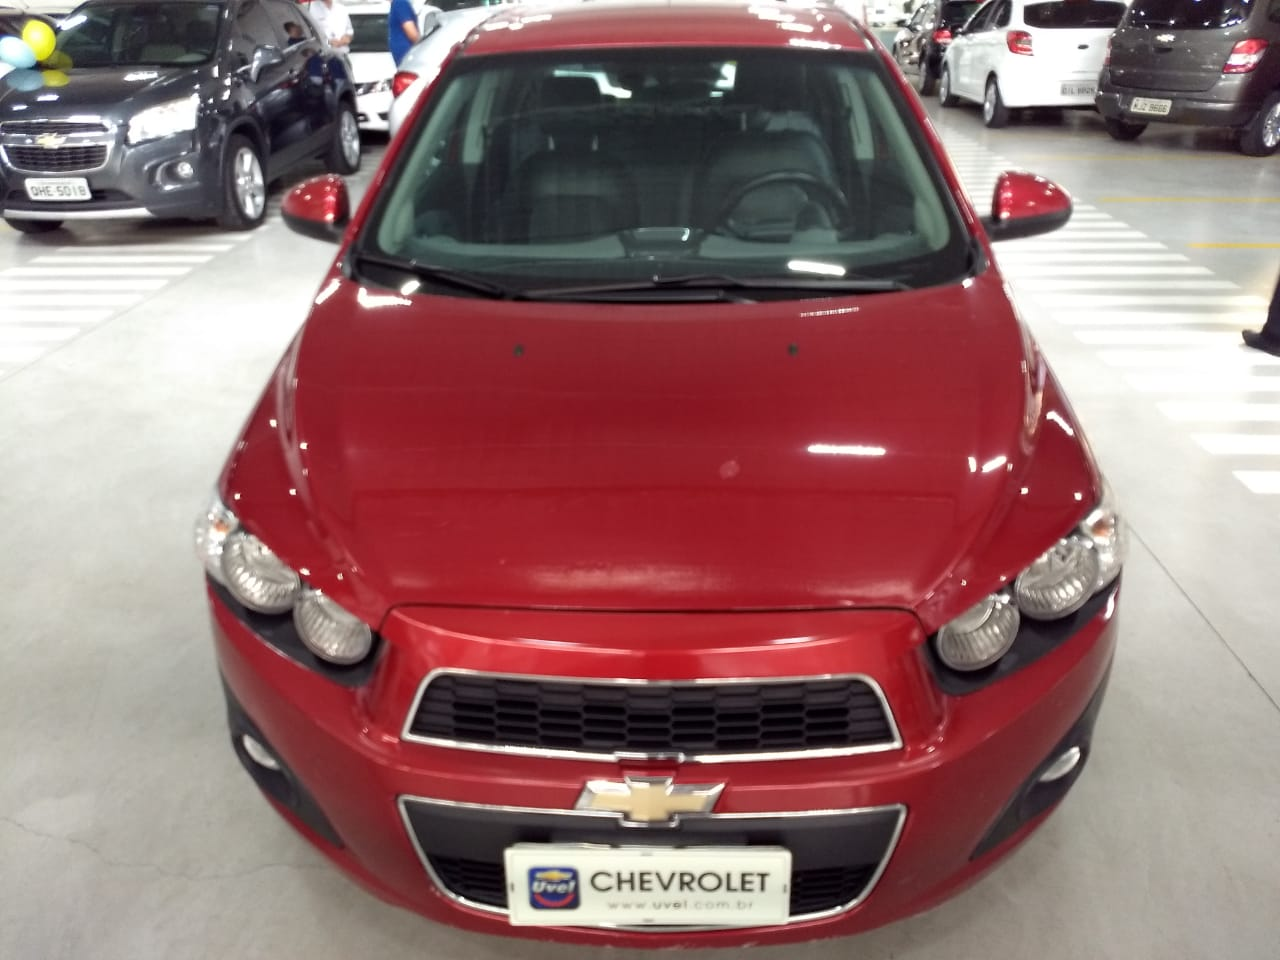 Chevrolet Sonic LTZ 1.6L 2014